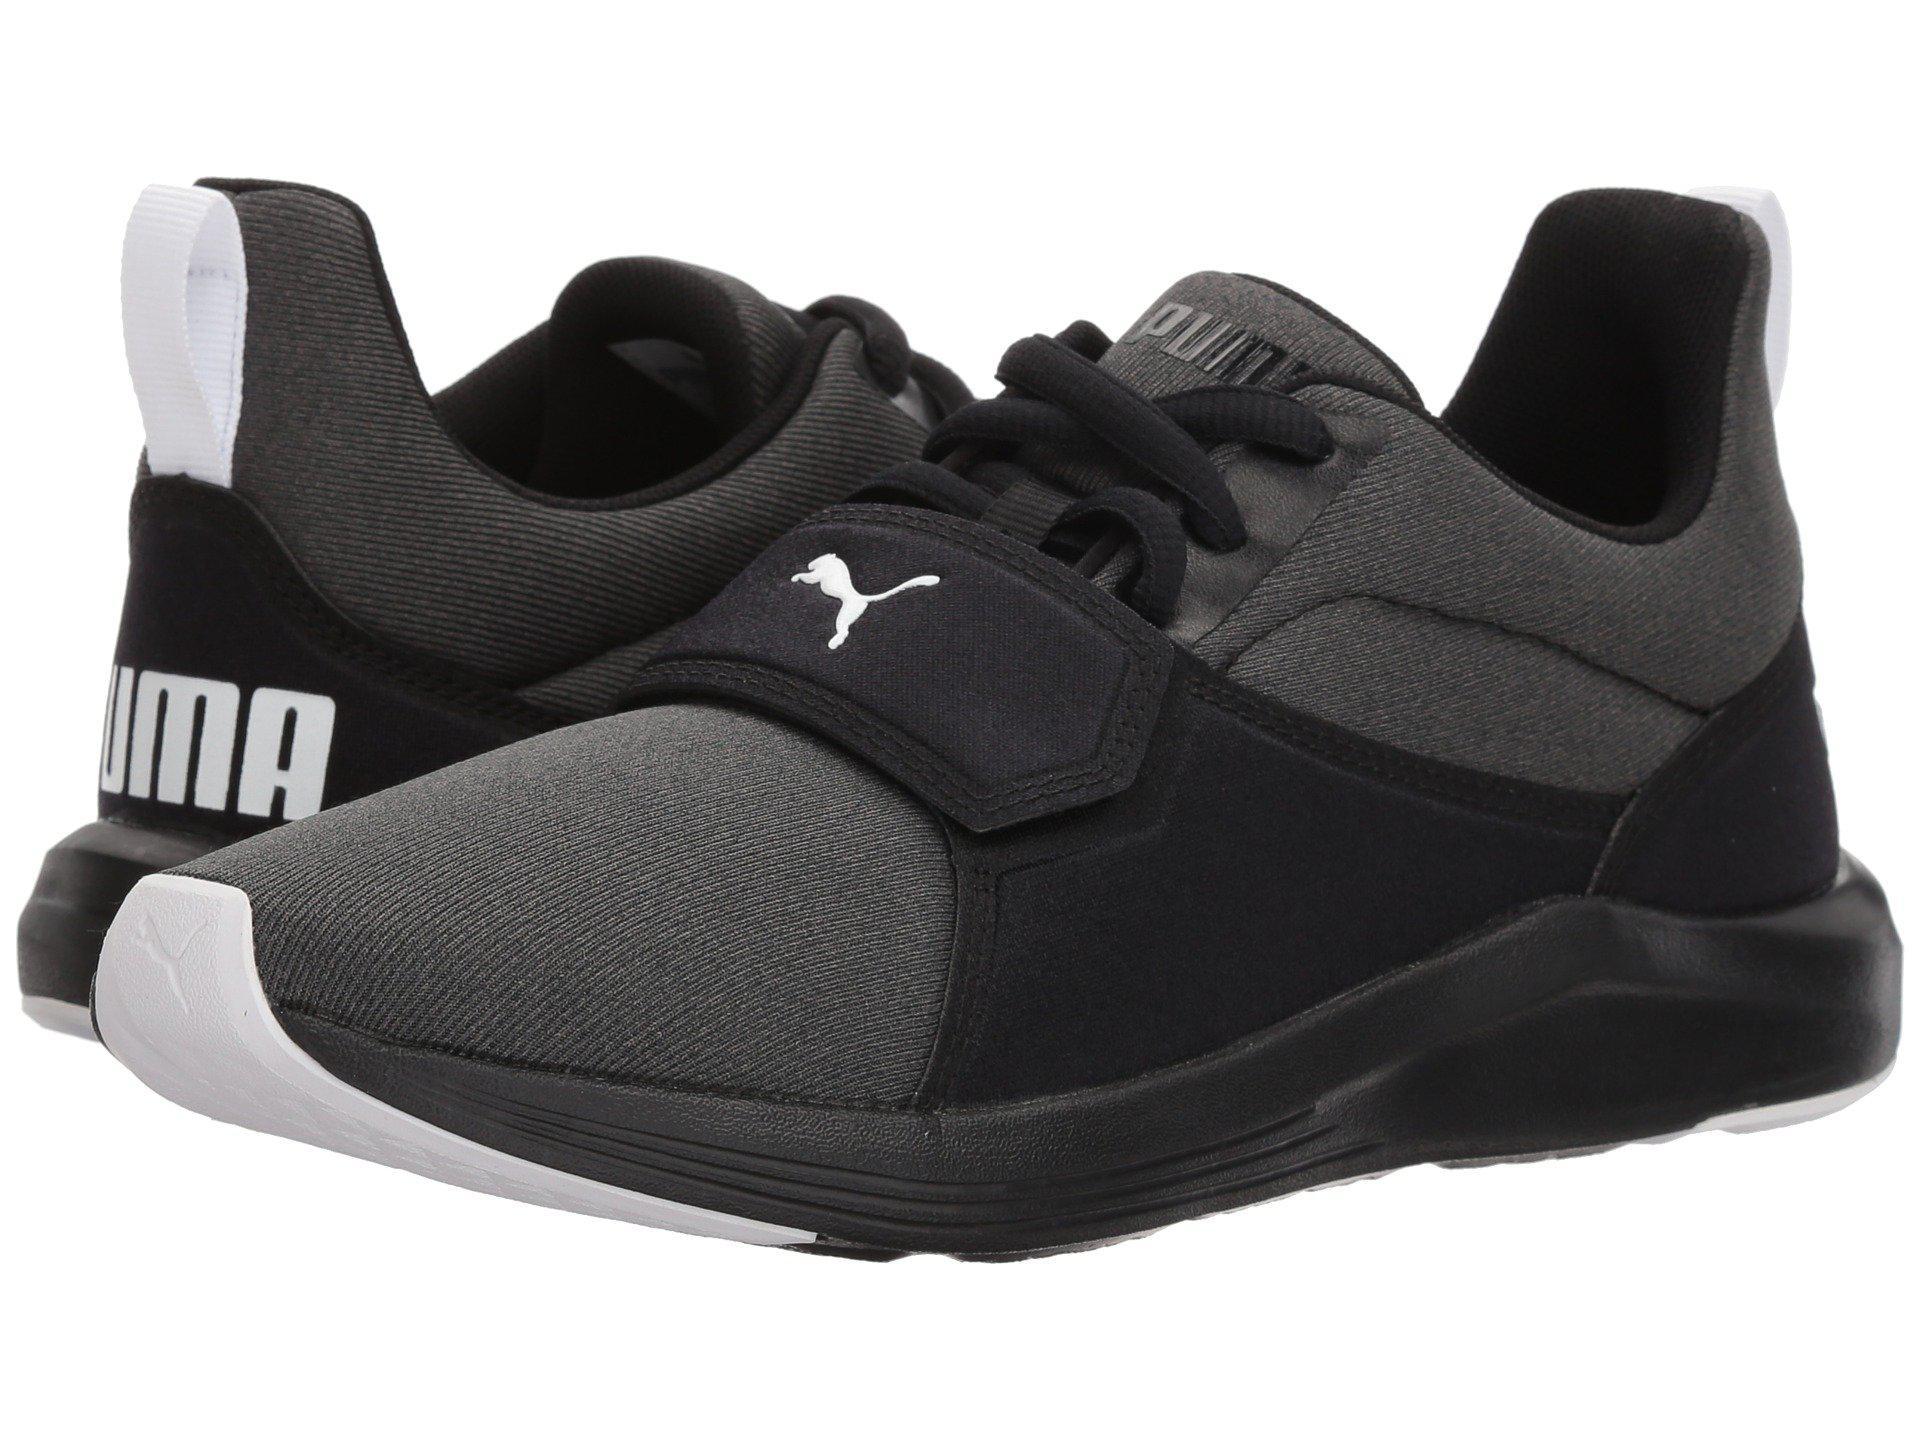 Lyst - PUMA Prodigy ( Black  White) Women s Shoes in Black 06a41d4b0c